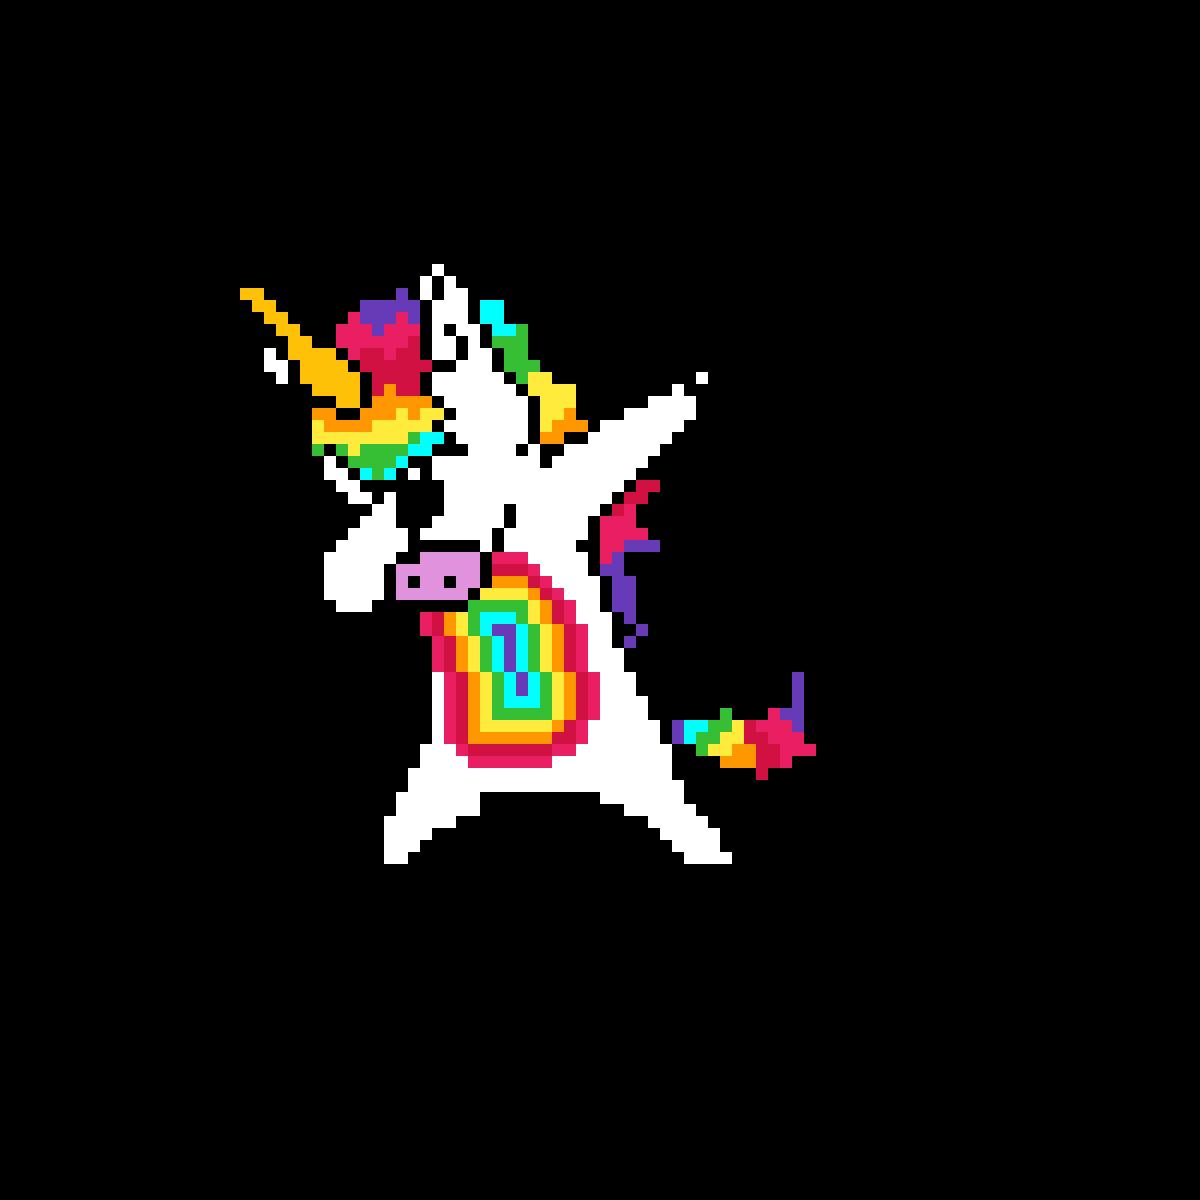 pixilart dabing unicorn by strangeturtle